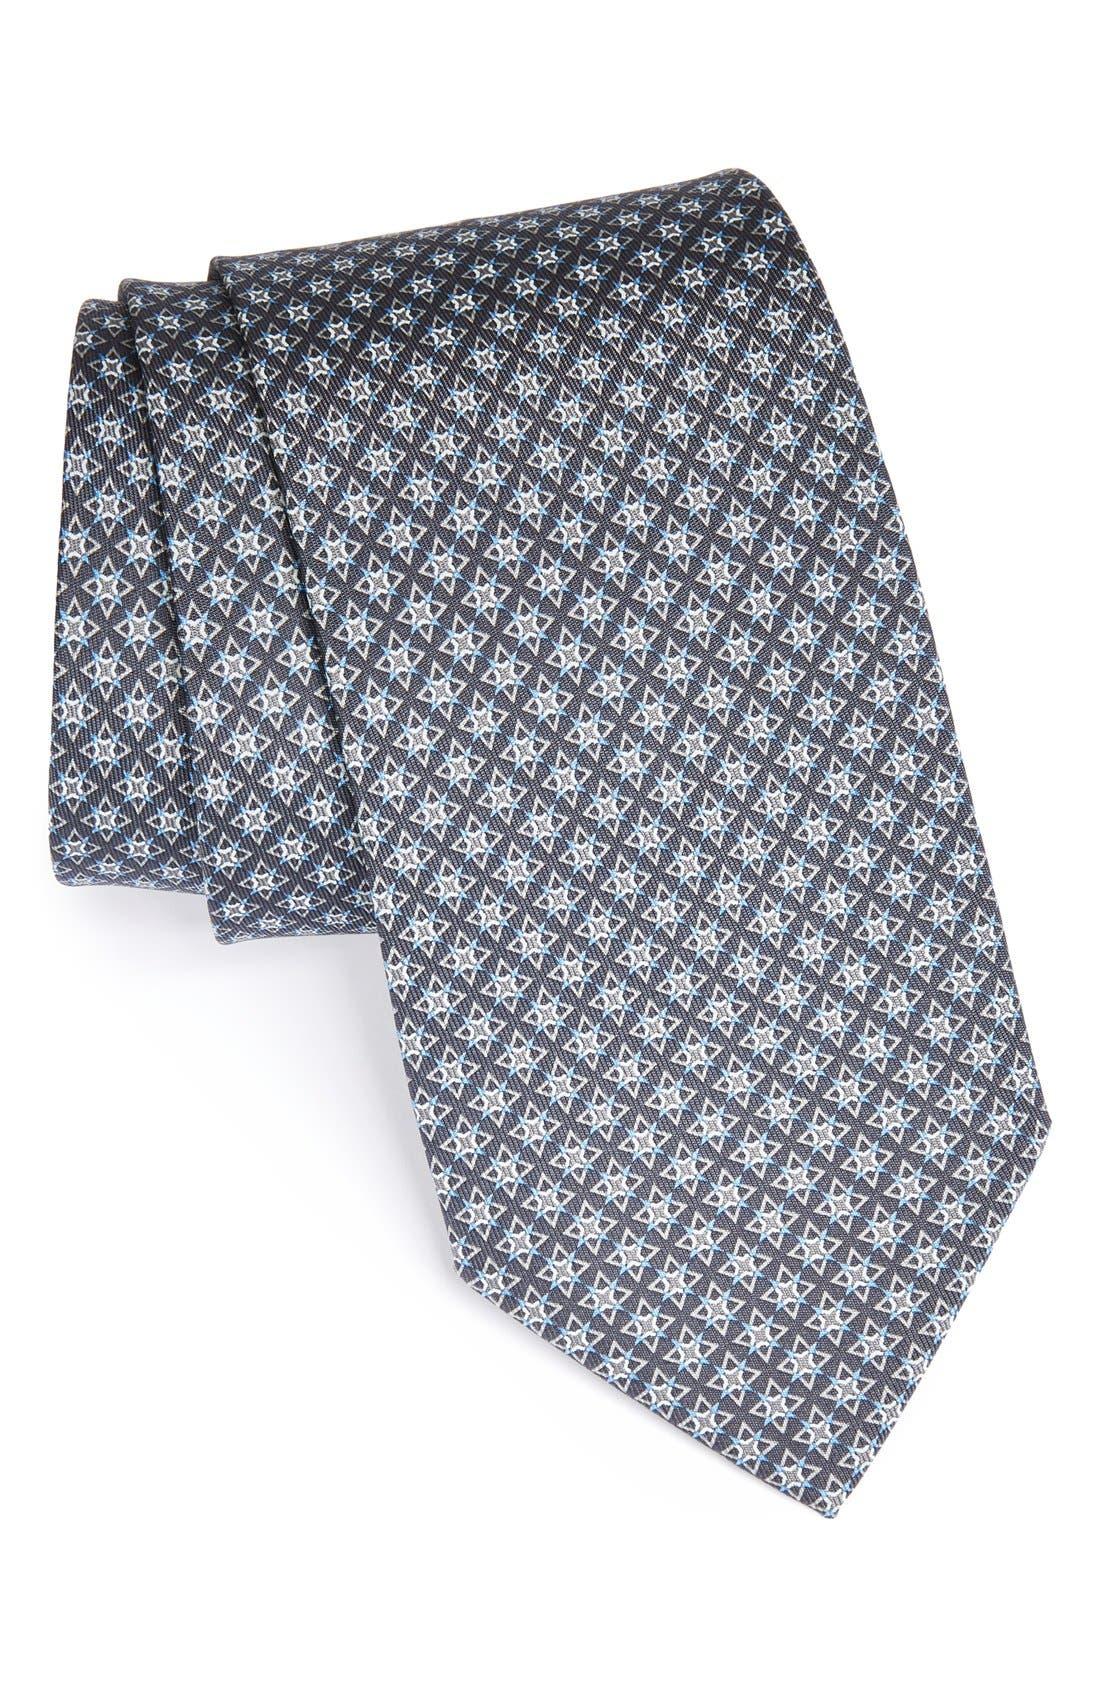 Main Image - Salvatore Ferragamo Star Print Silk Tie